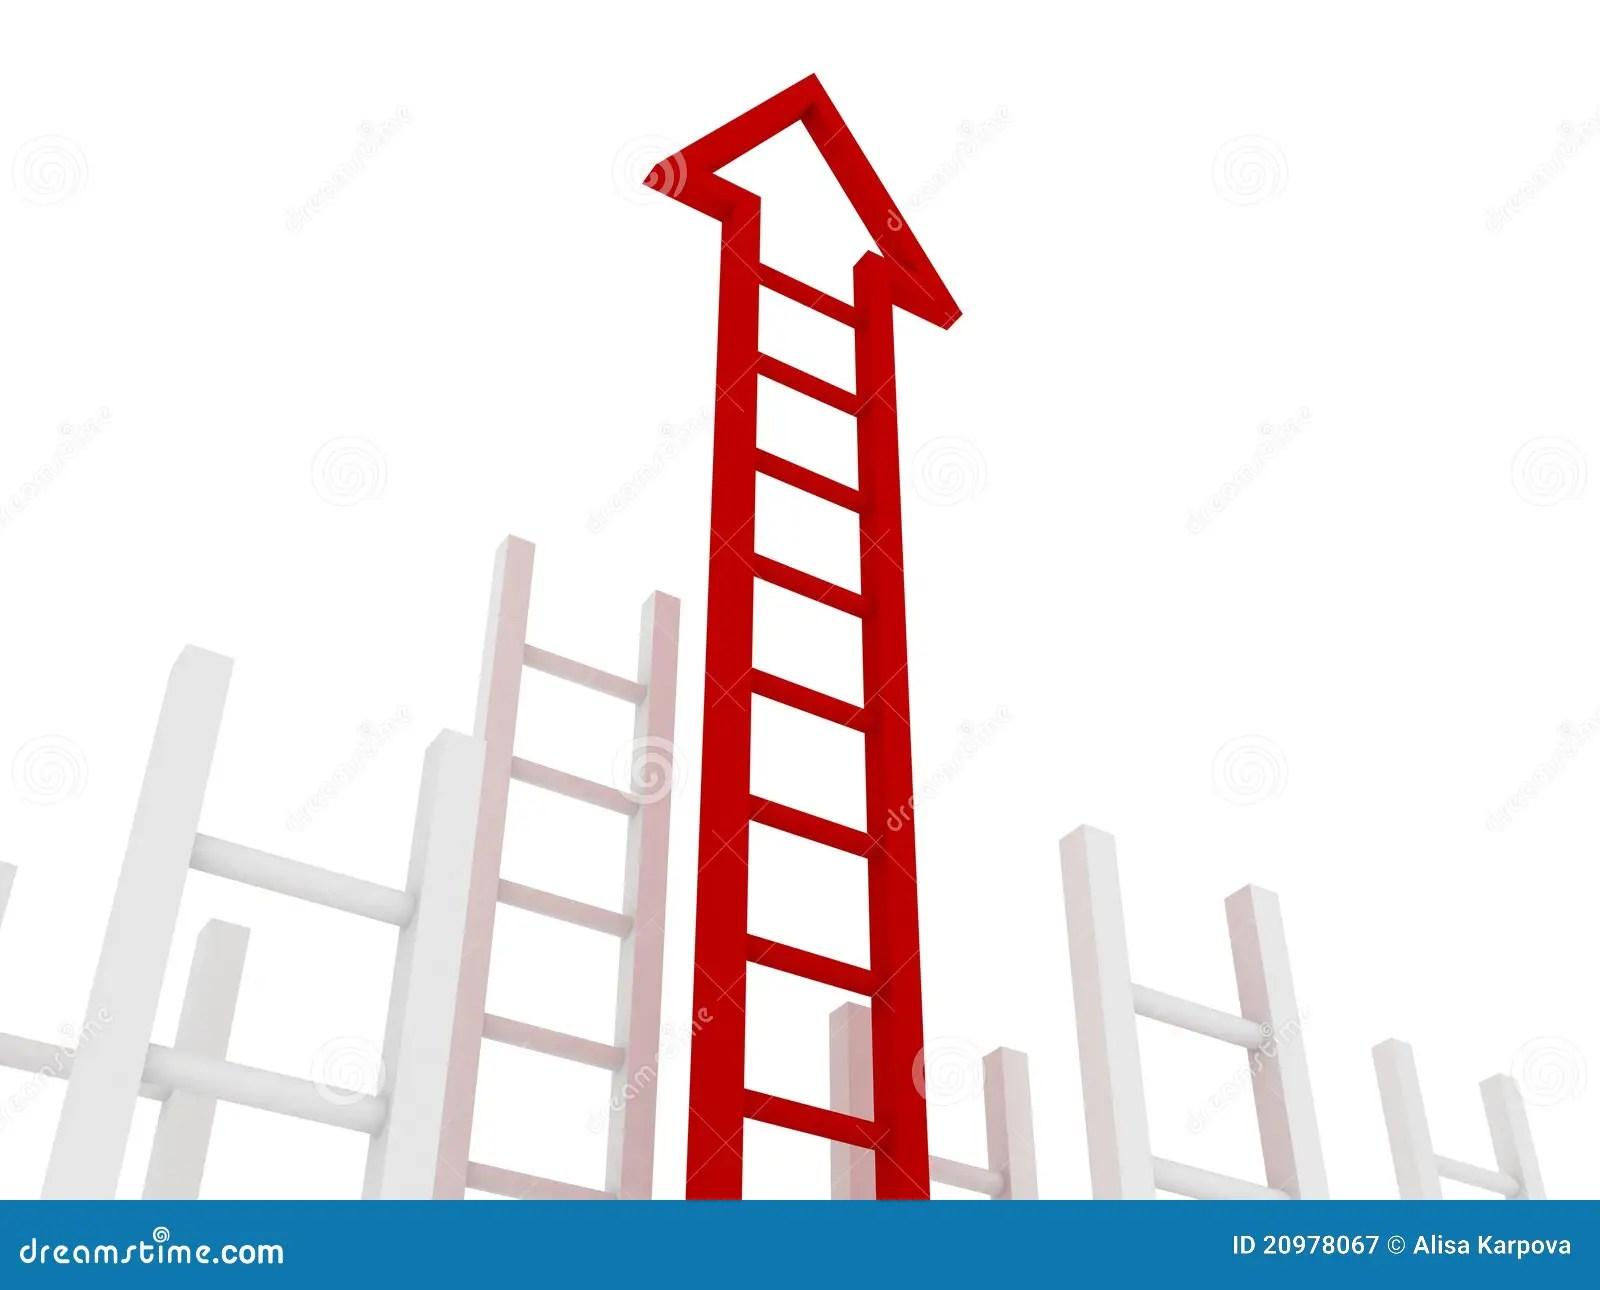 Ladder Of Success Red Arrow Stock Illustration